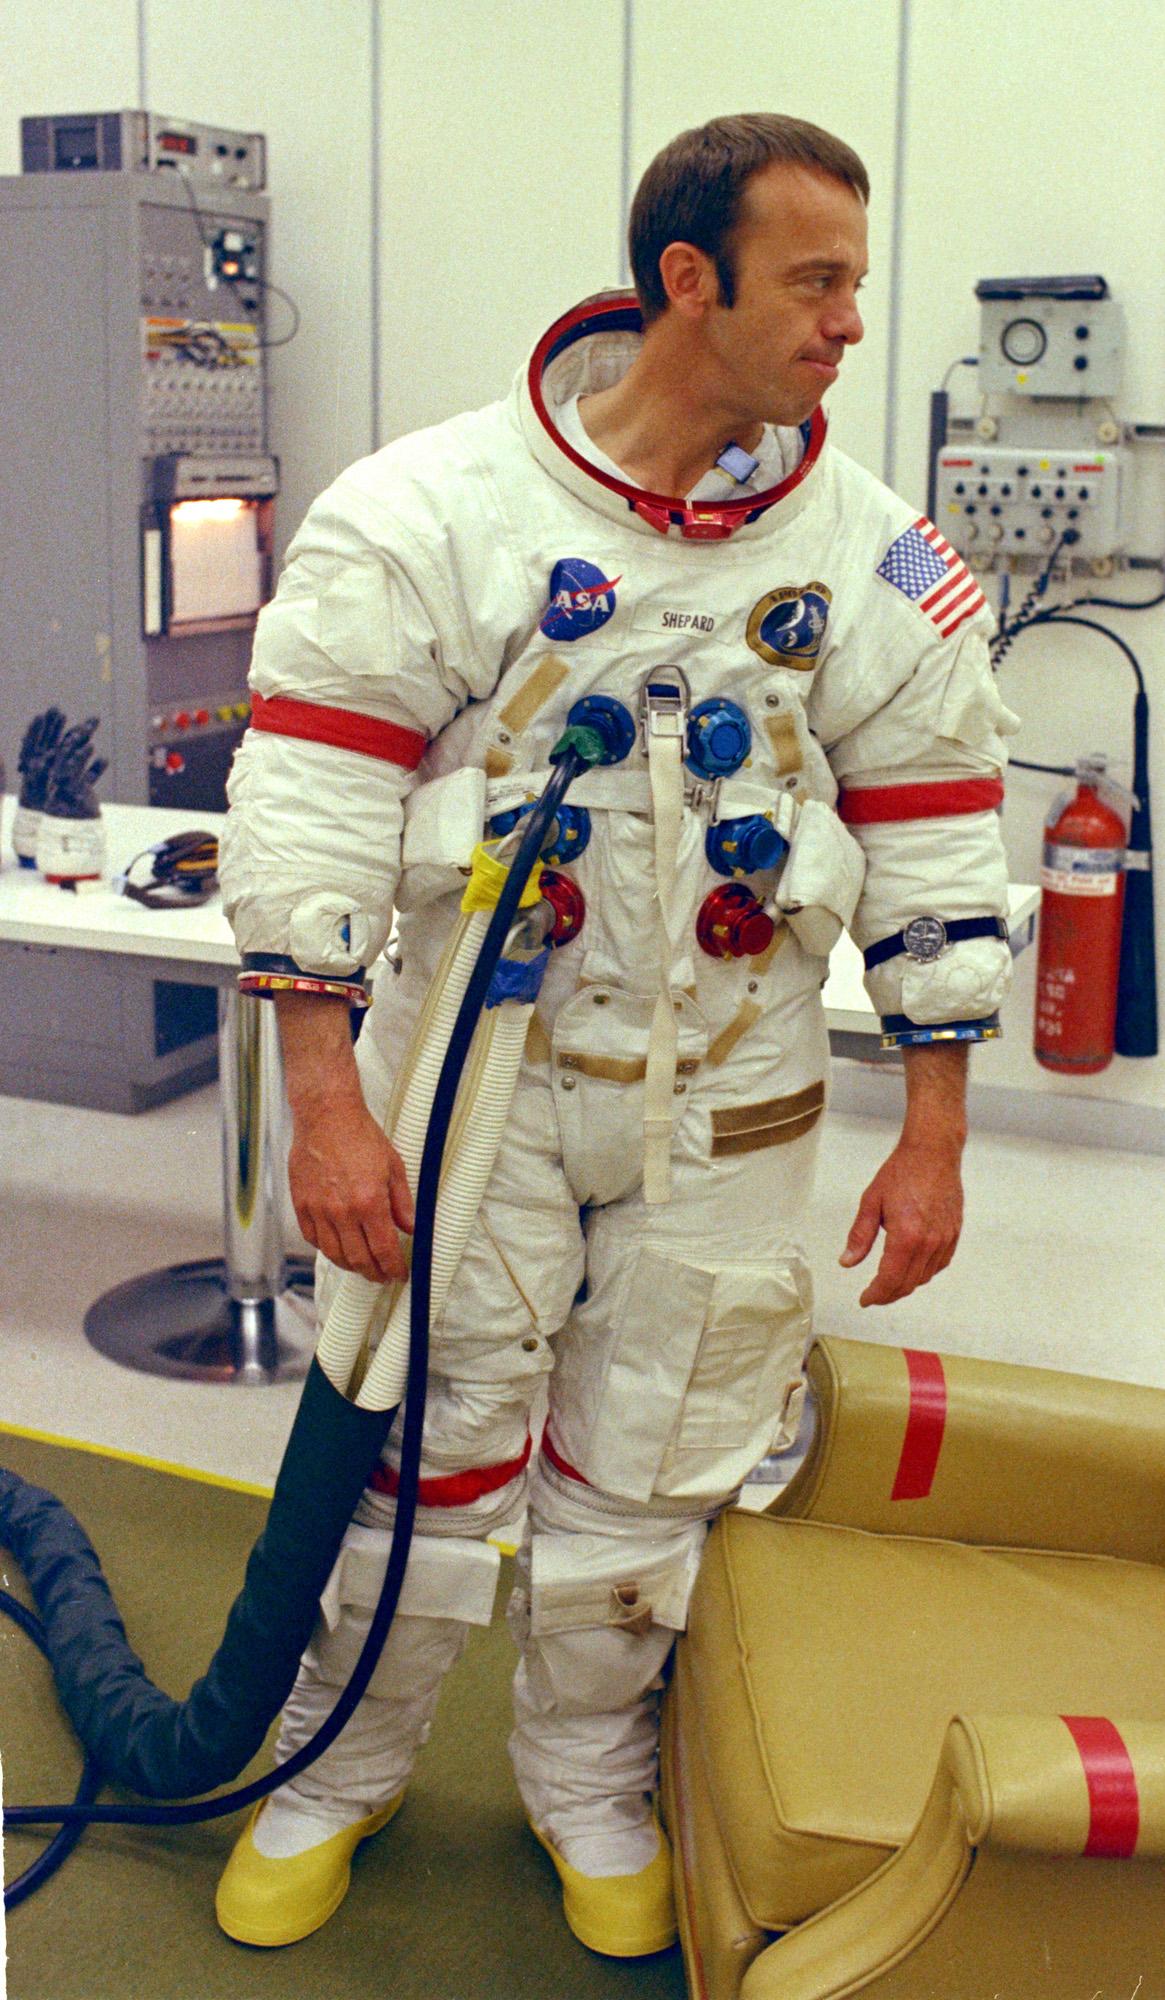 Apollo 14 commander Alan Shepard